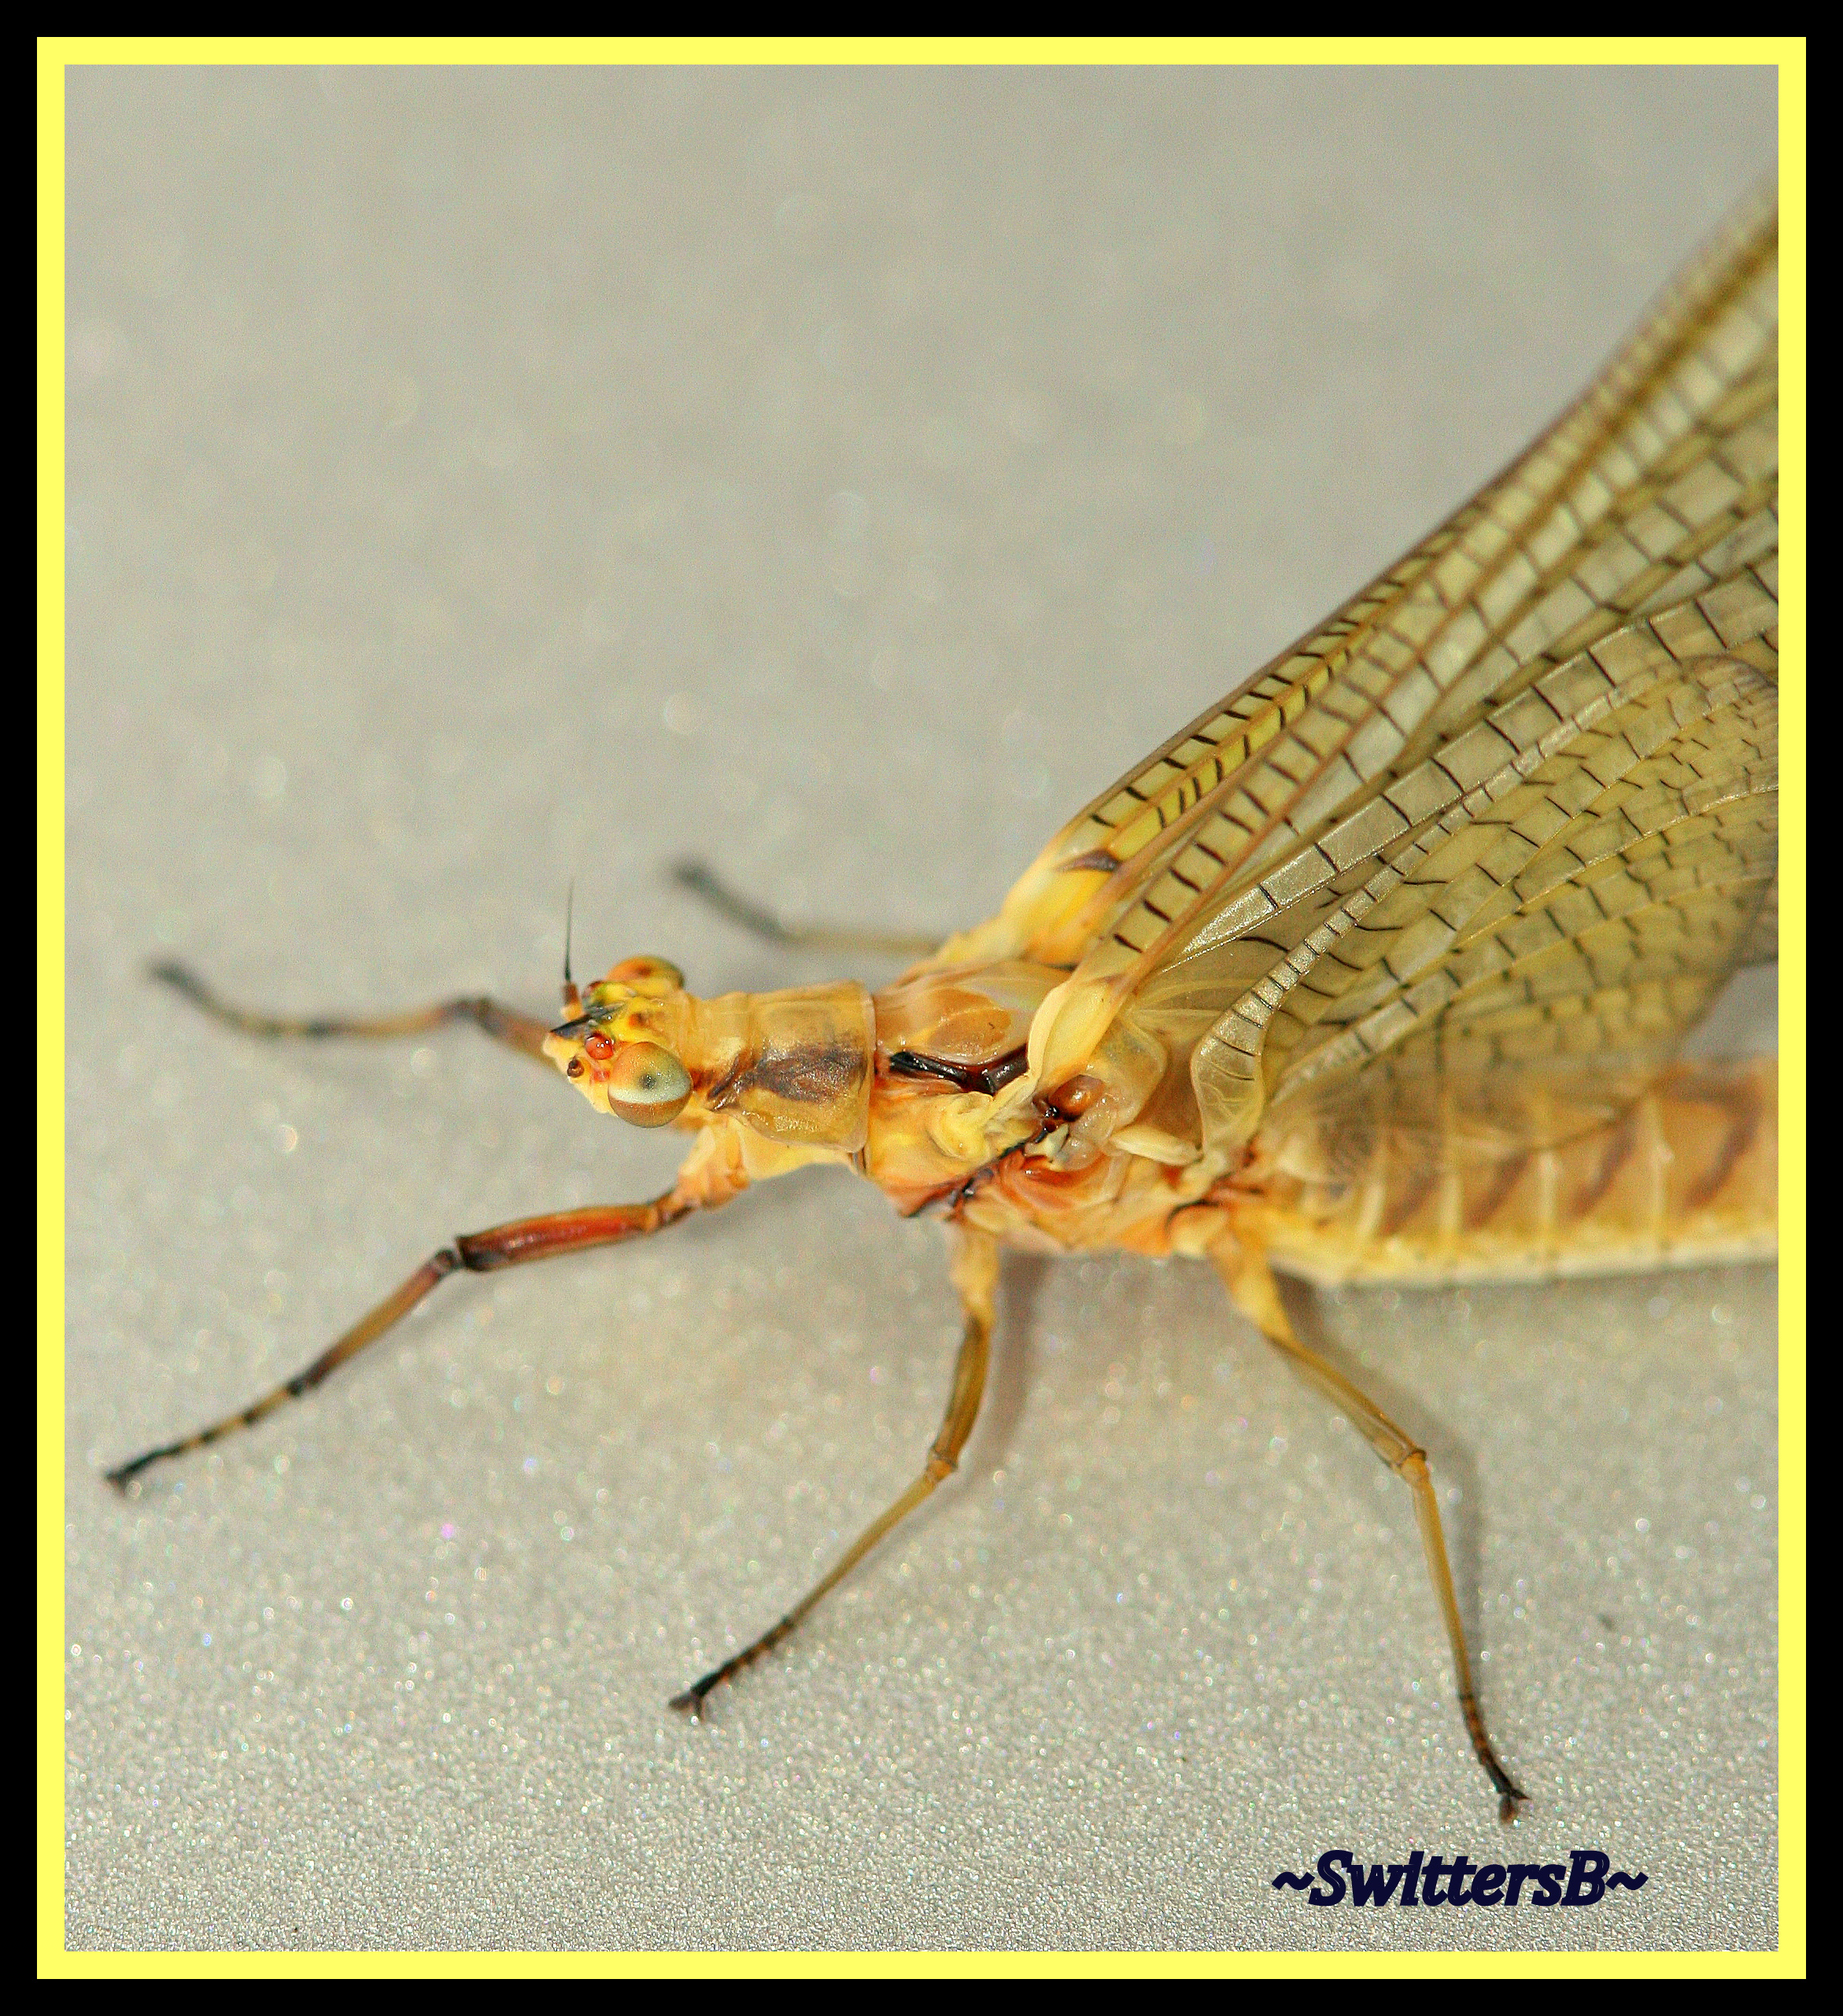 Fly fishing entomology the cat swittersb exploring for Fly fishing entomology